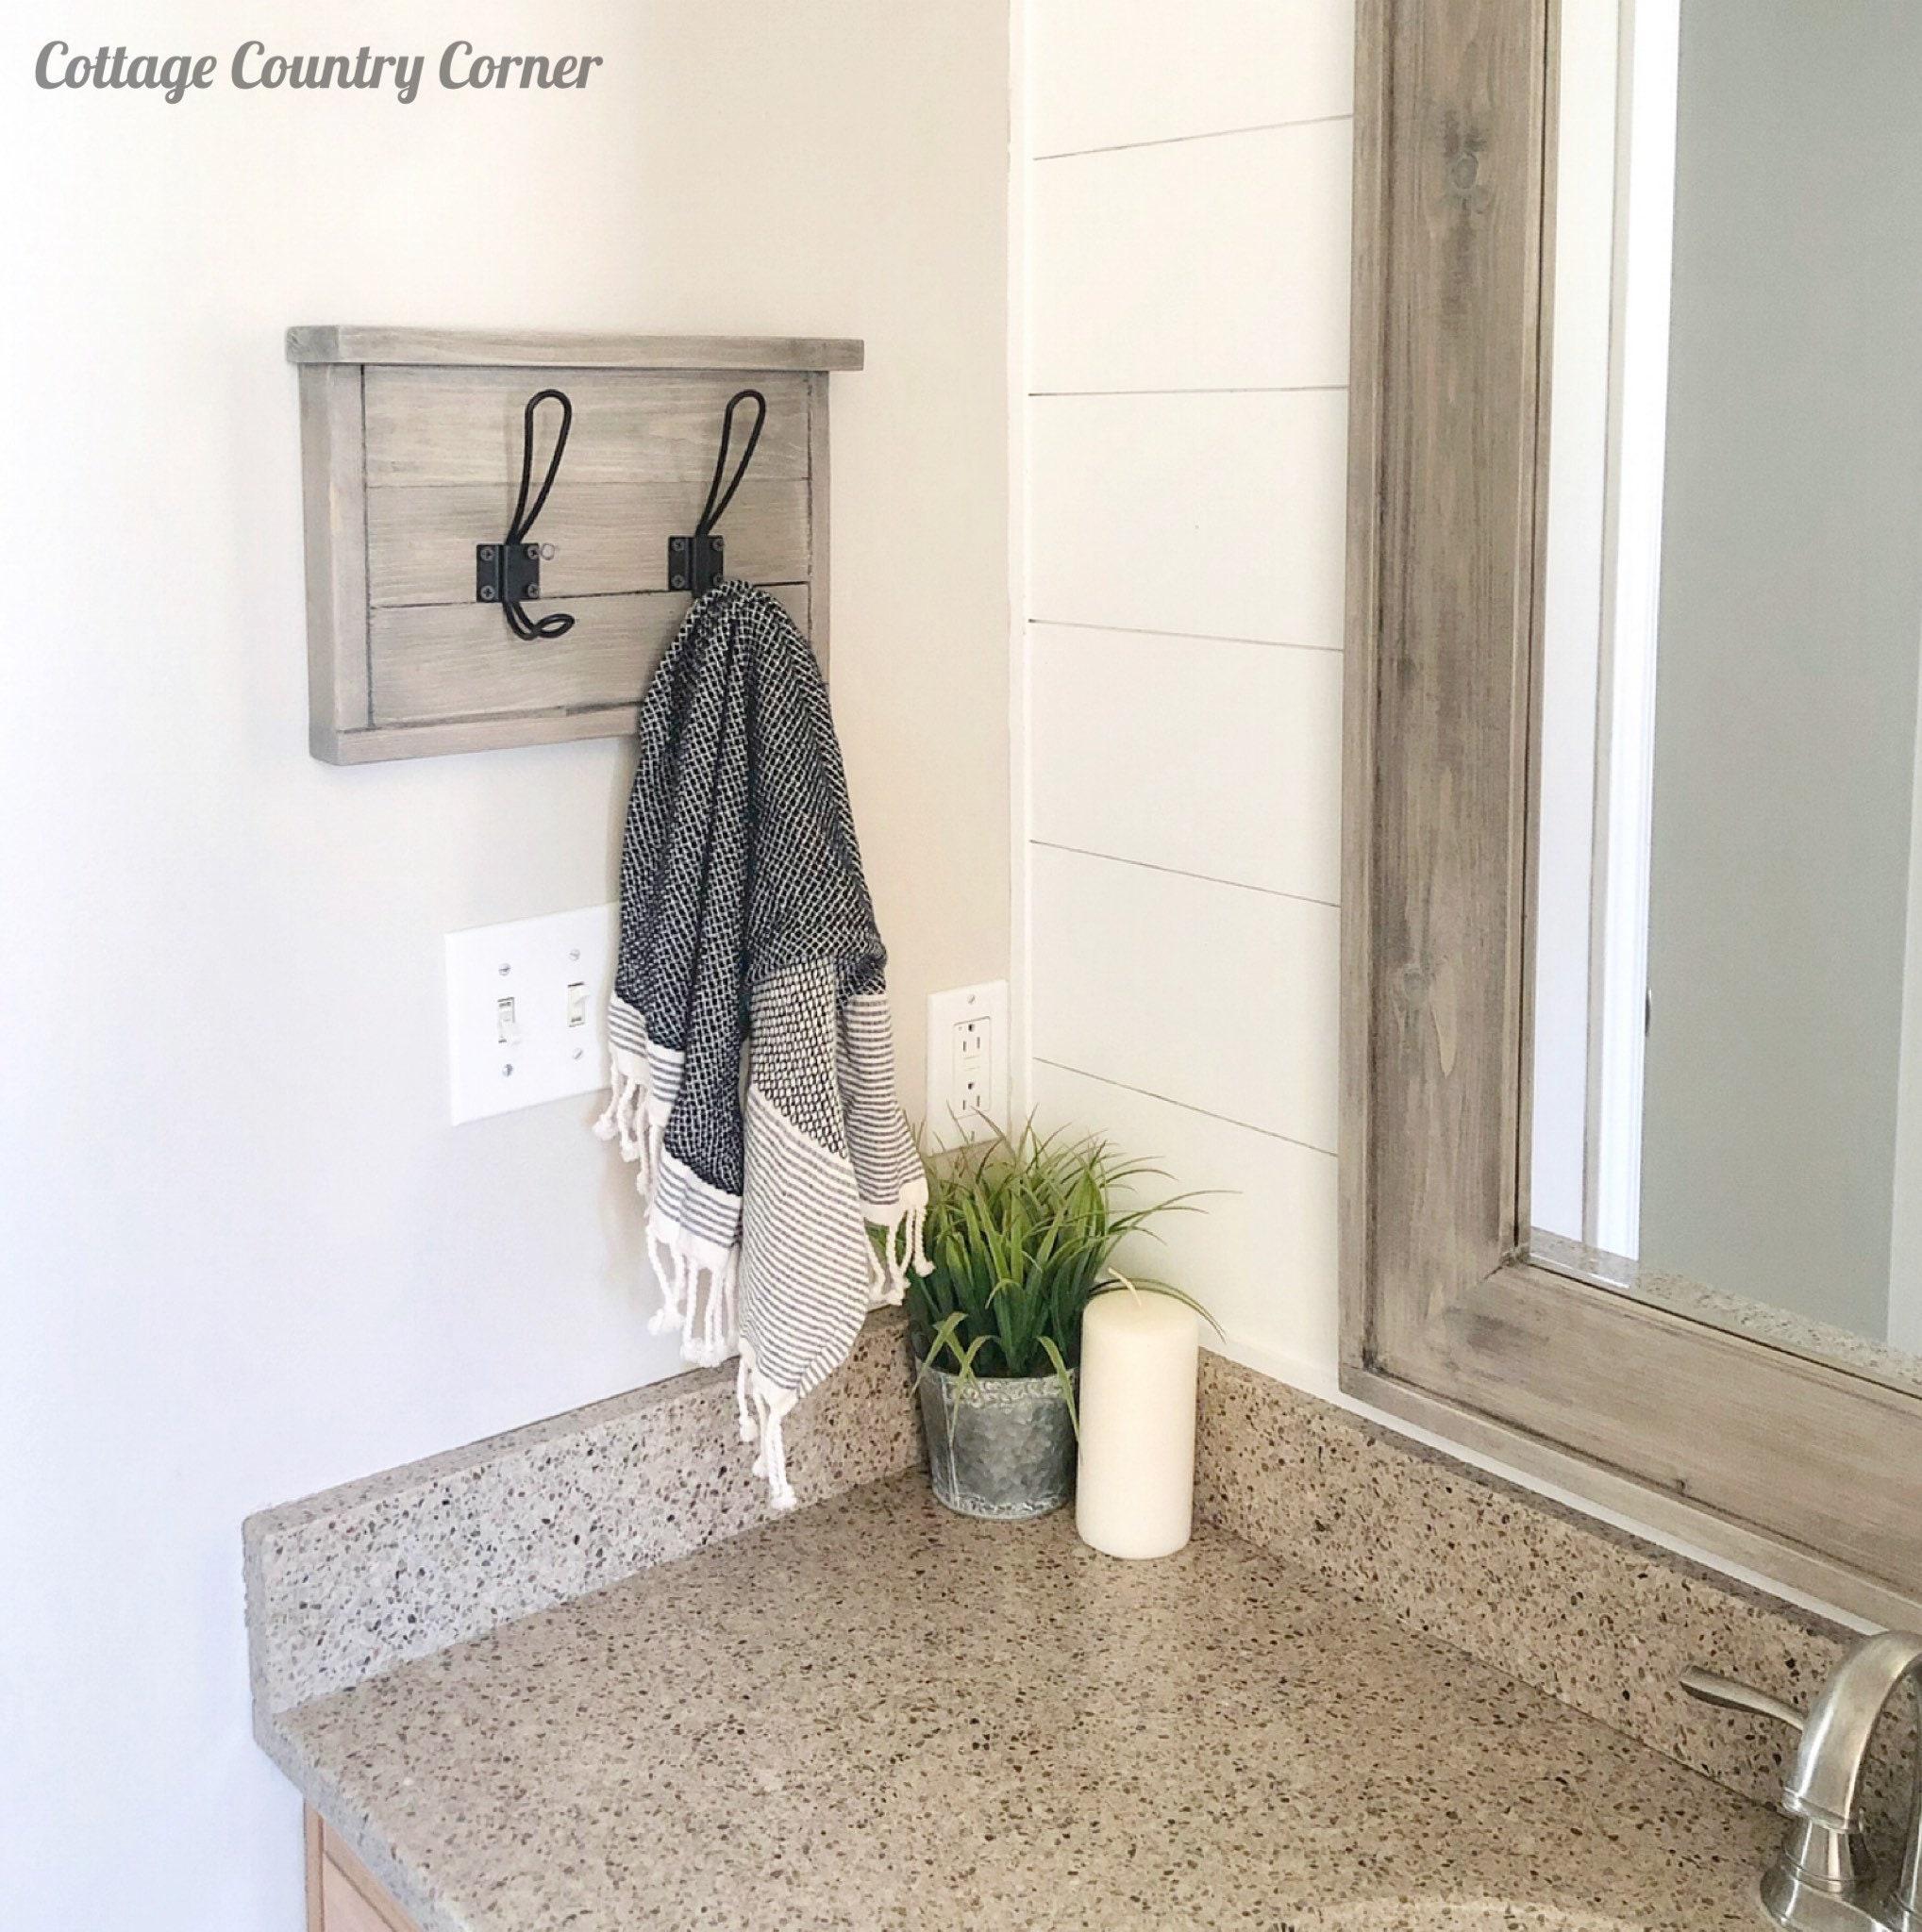 Prime Hand Towel Holder Towel Rack Bathroom Decor Towel Rack Farmhouse Bathroom Towel Hook Kitchen Towel Holder Industrial Interior Design Ideas Skatsoteloinfo